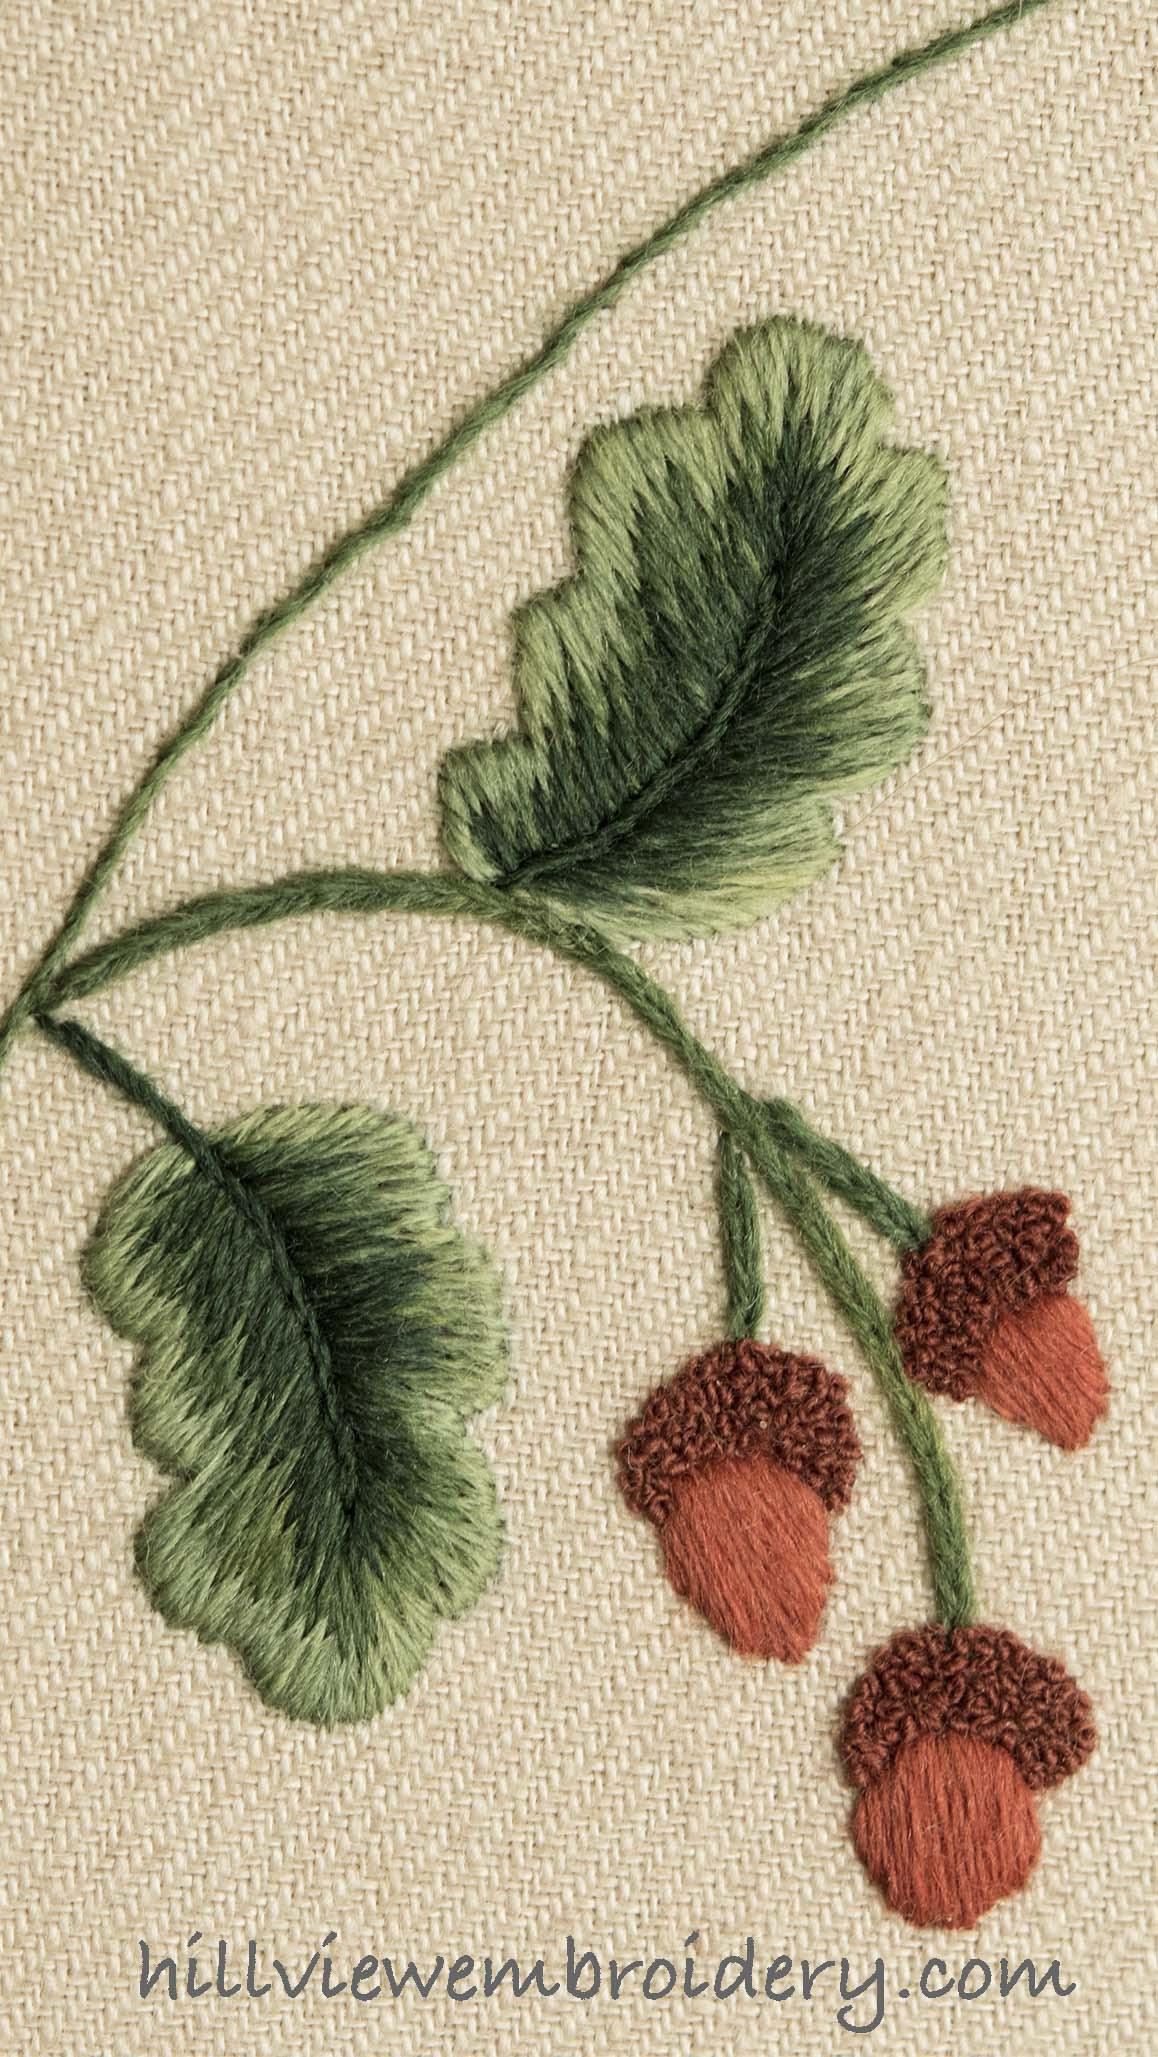 Oak leaves and acorns worked on a modern interpretation of crewelwork